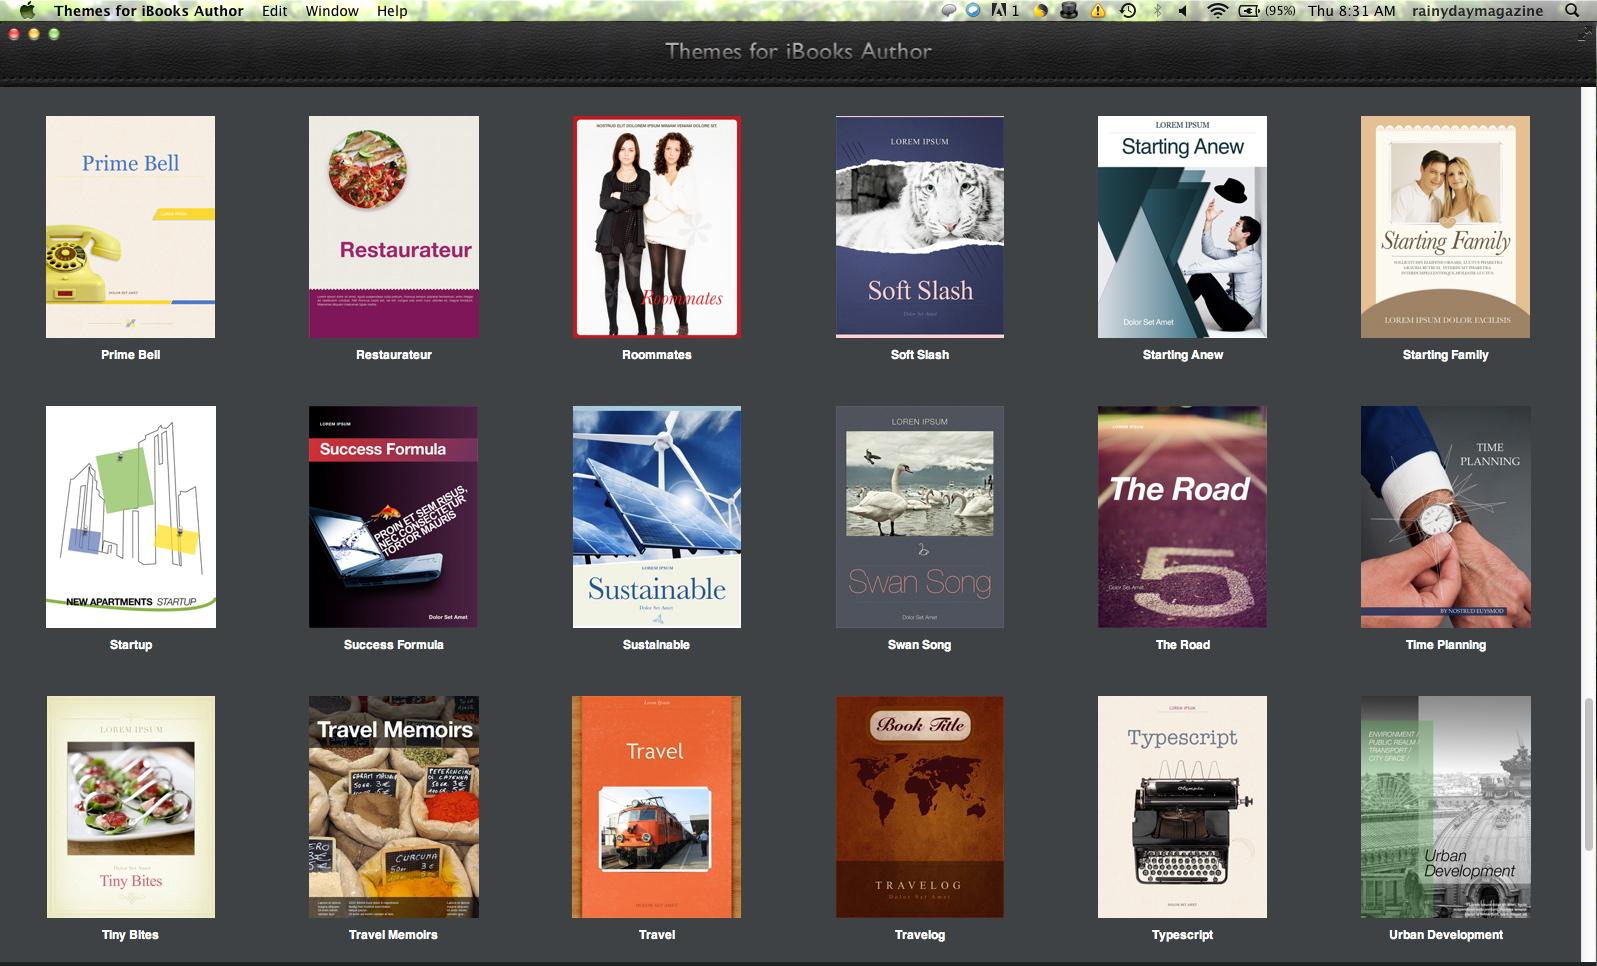 More iBooks Templates | RainyDayMagazine